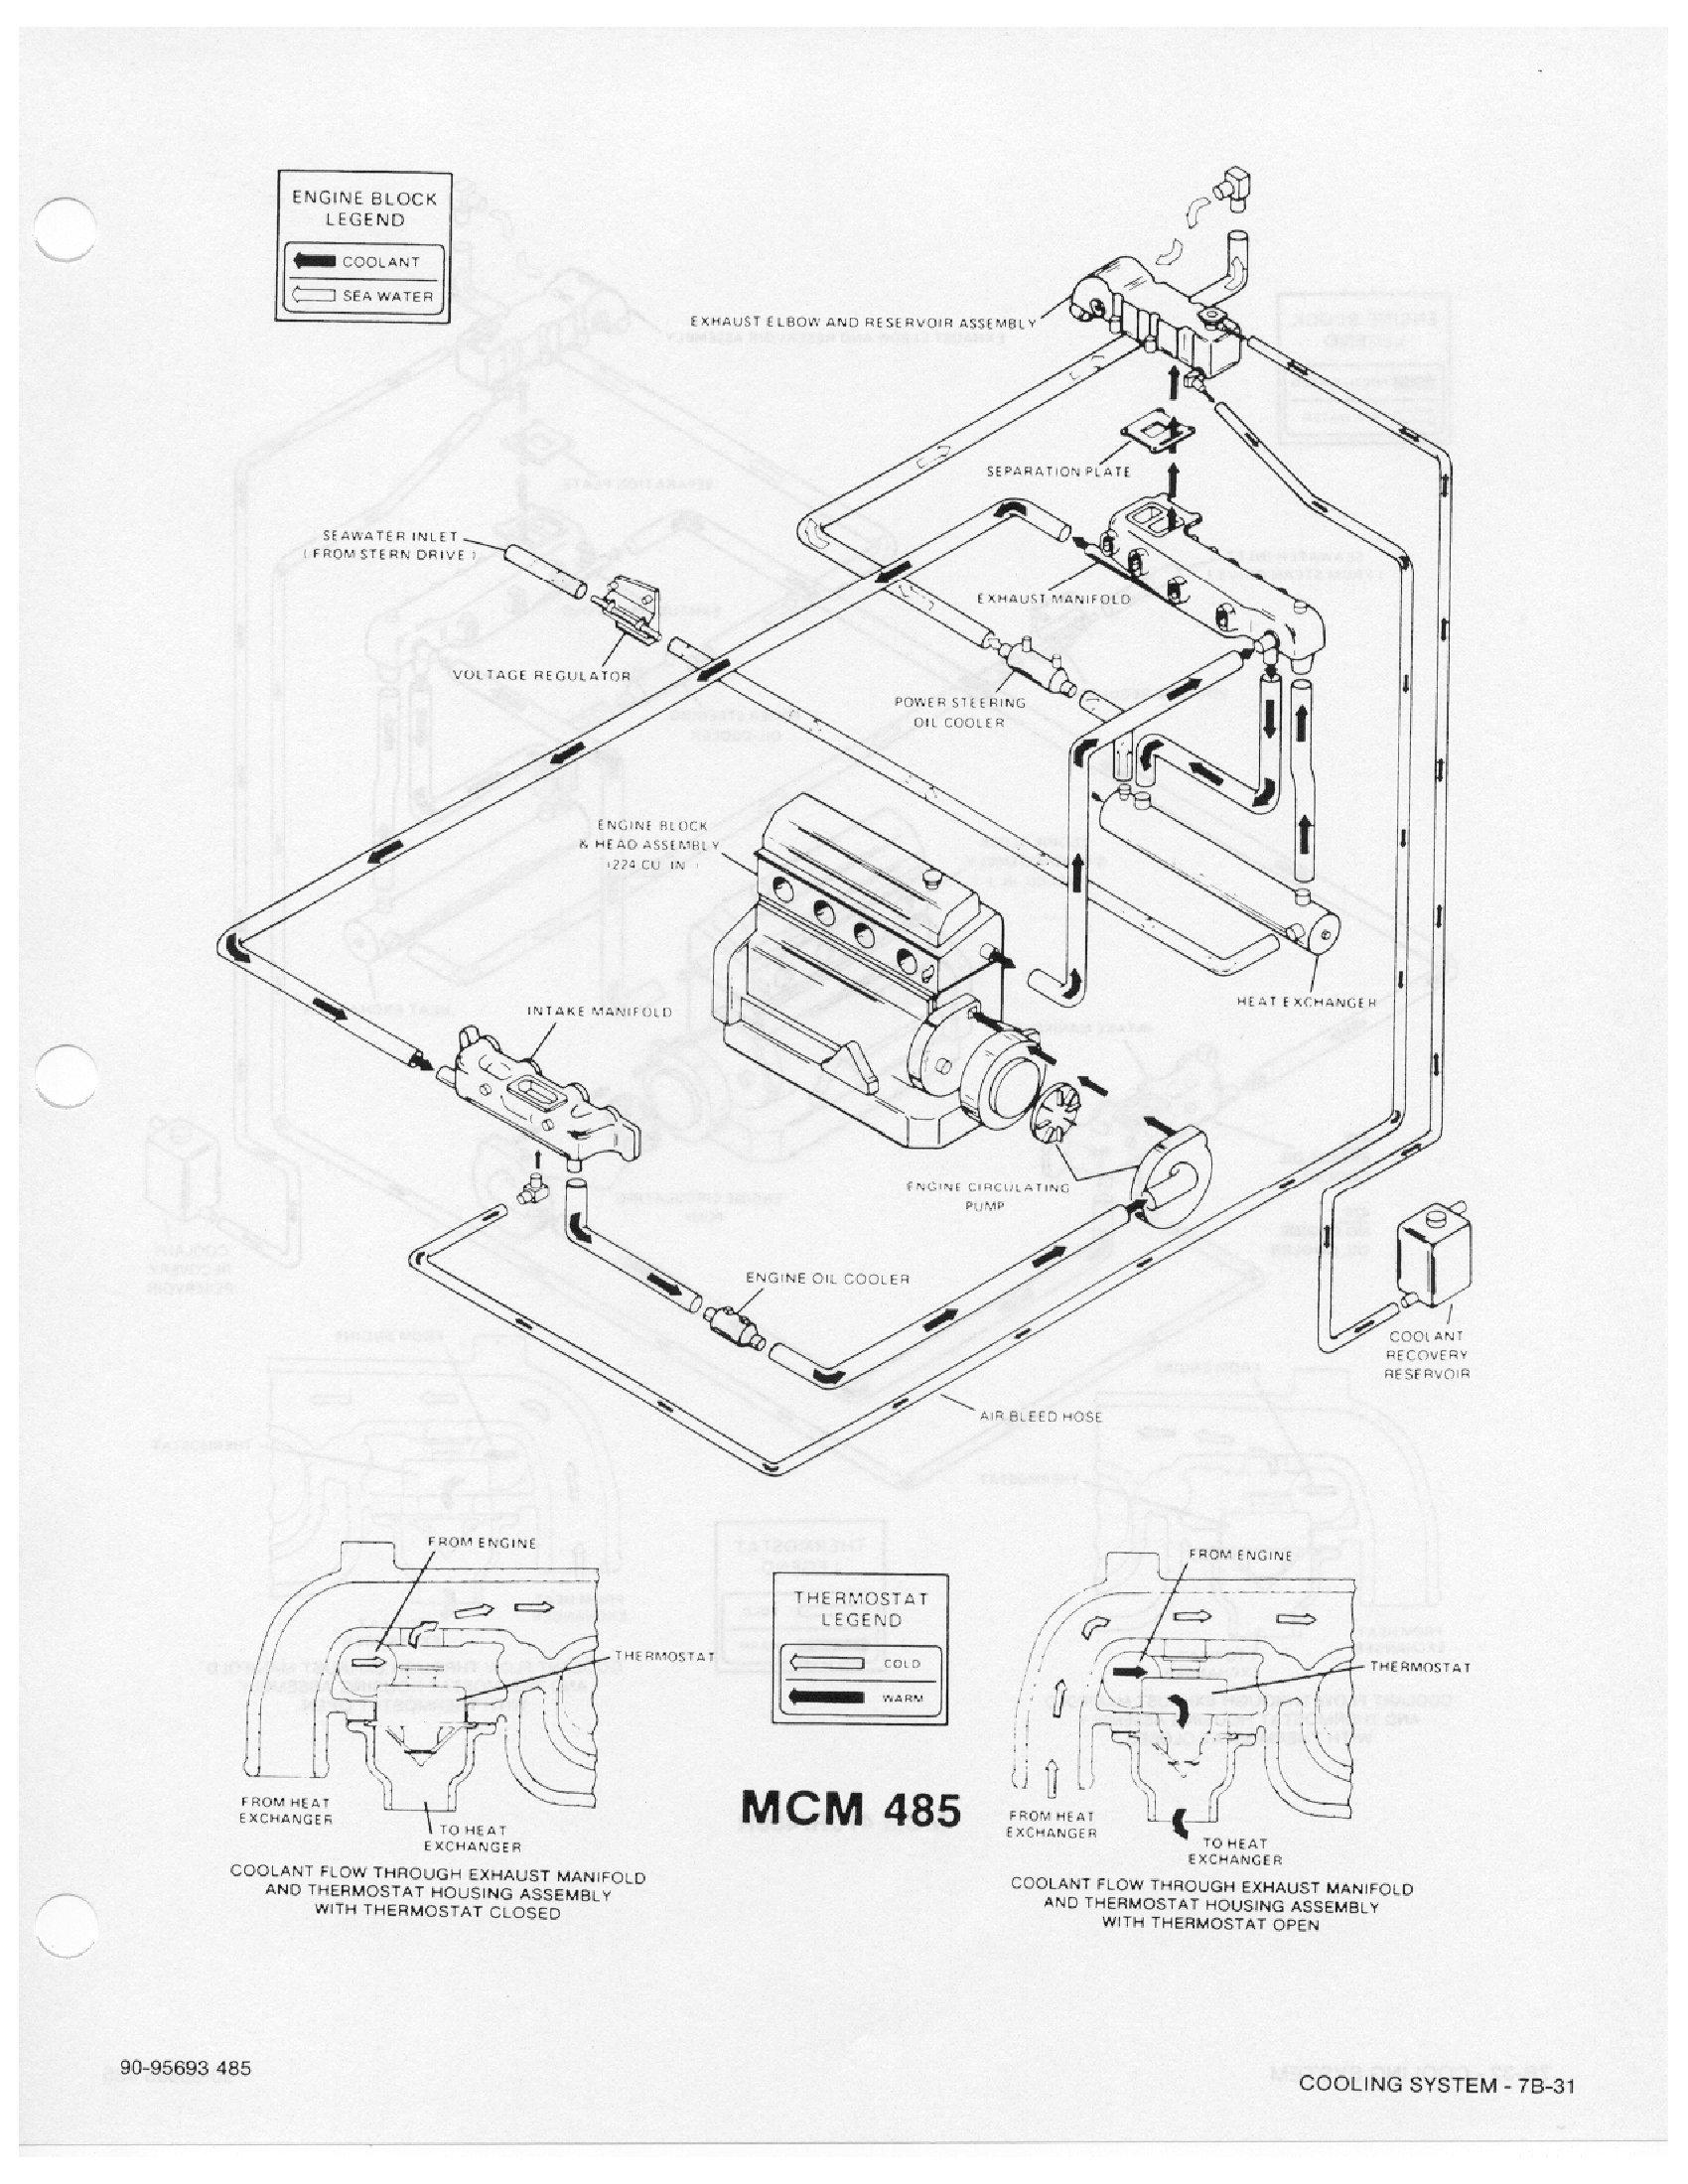 volvo penta sterndrive parts diagram  volvo  free engine